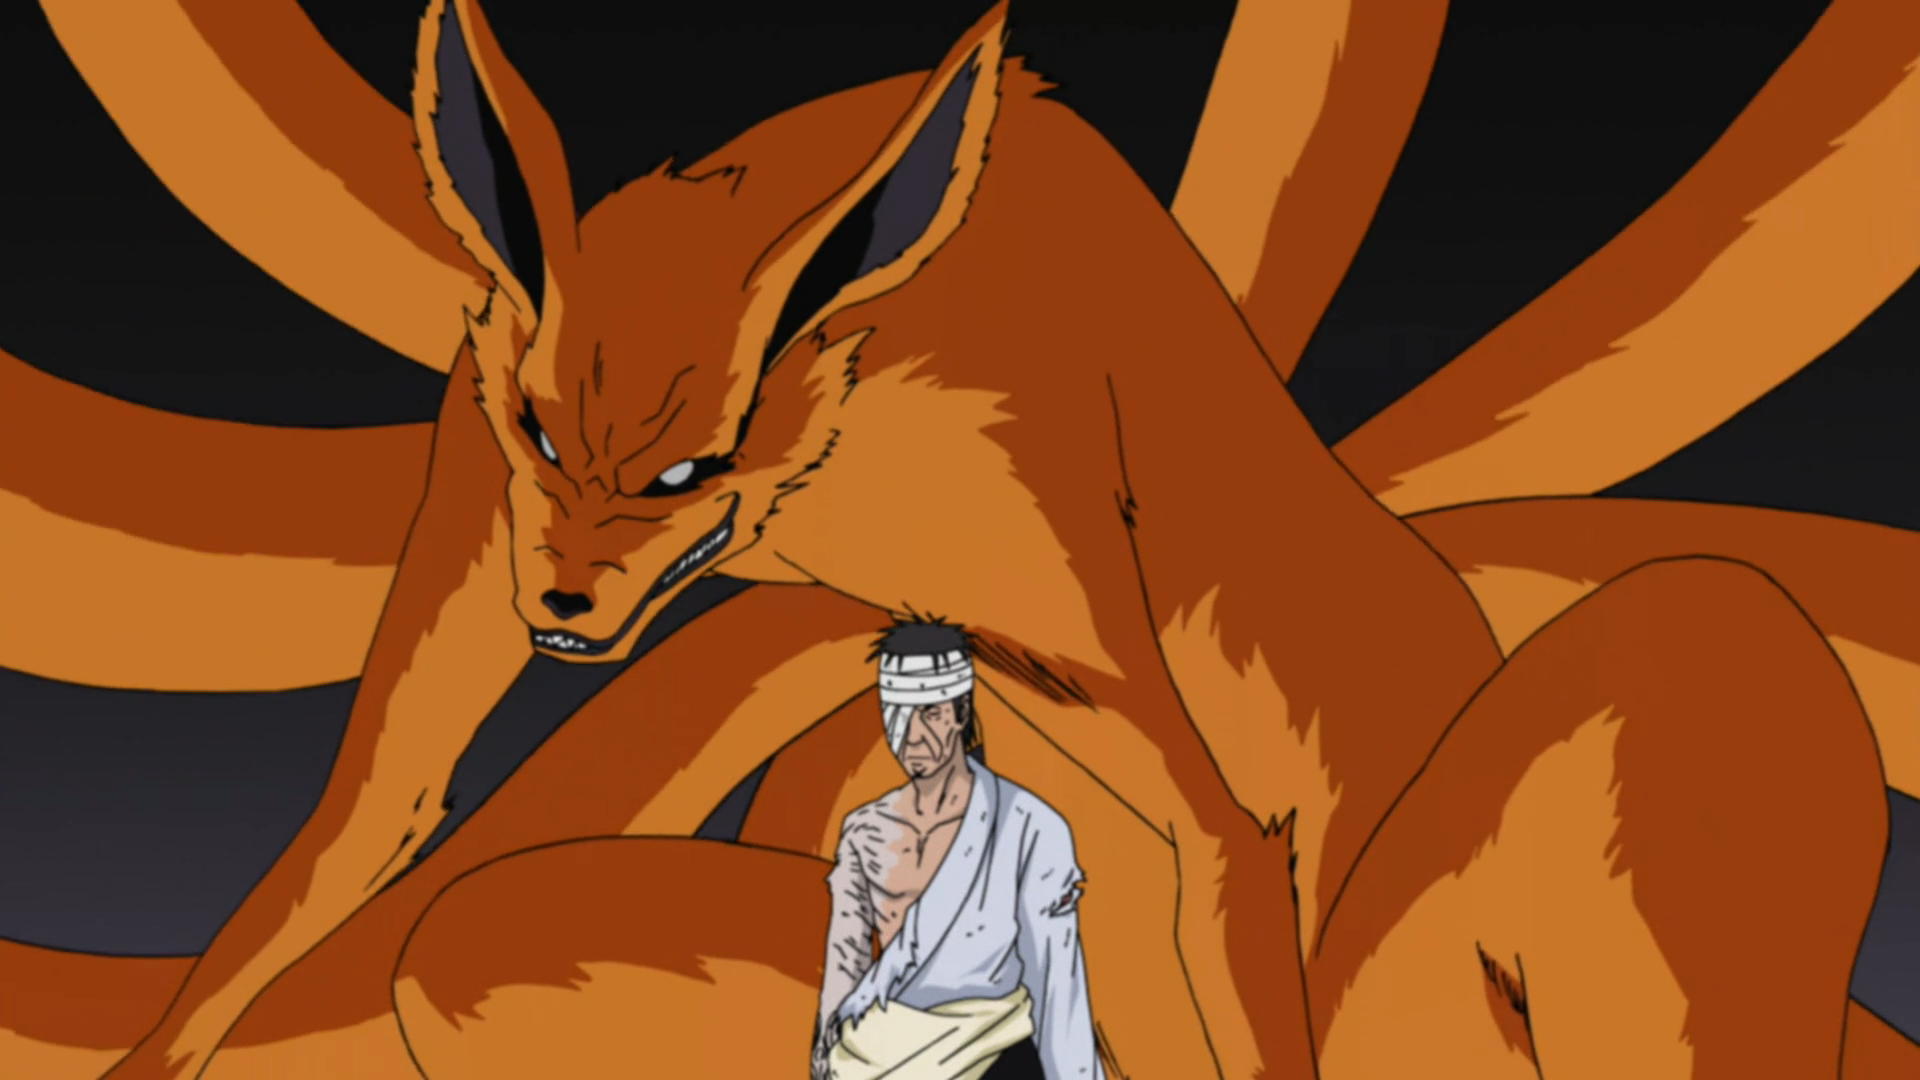 kushina and naruto meet his father